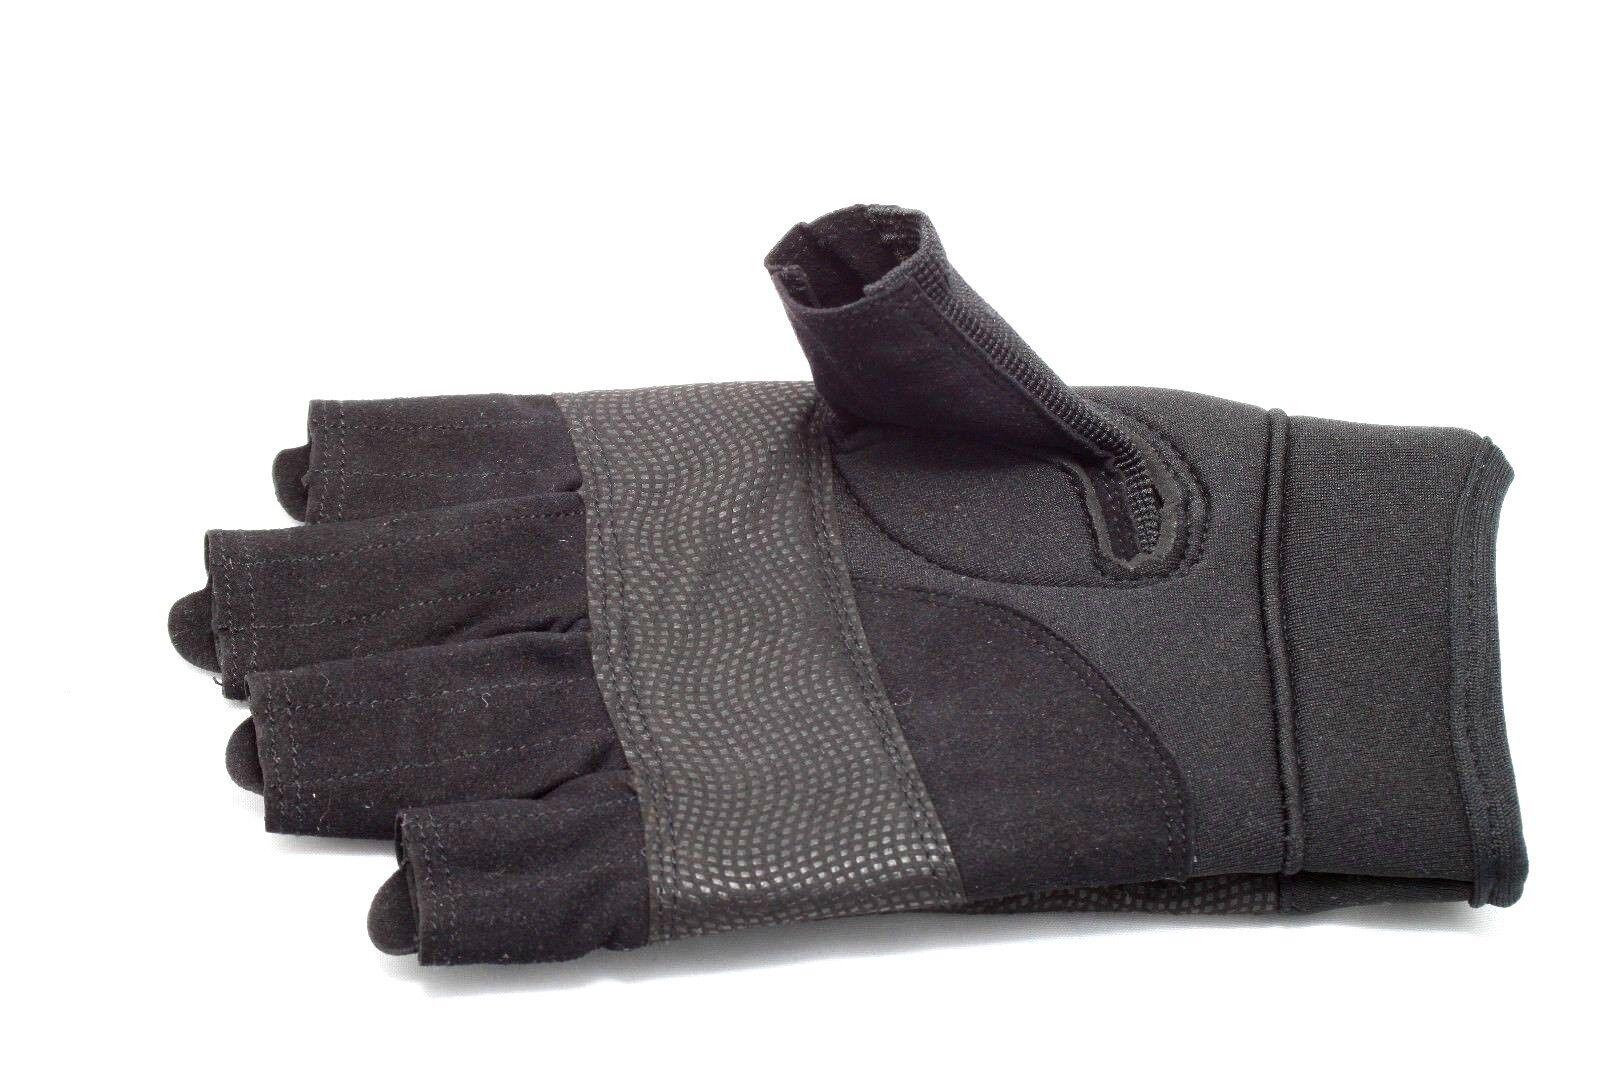 Fitness Handschuhe Trainingshandschuhe Neopren Handschuh Kraft Training Sport XL